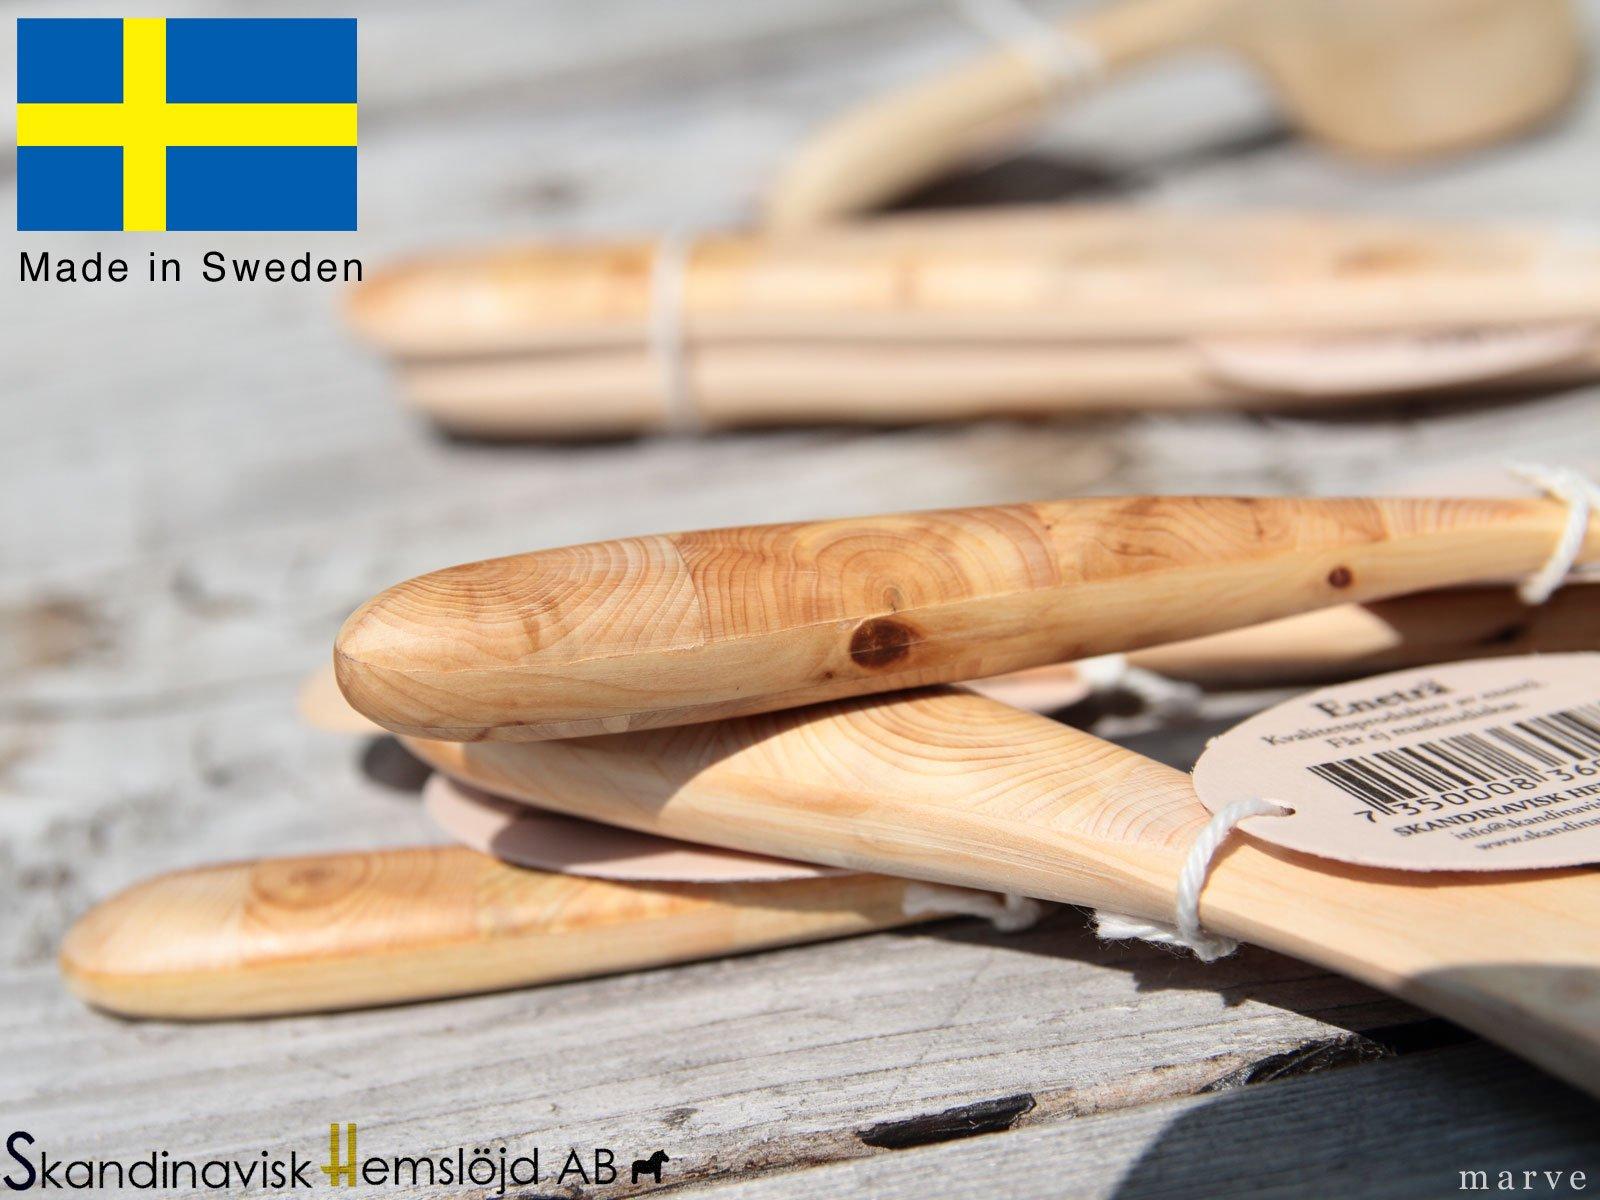 Skandinavisk Hemslojd AB フォーク「インレイ」